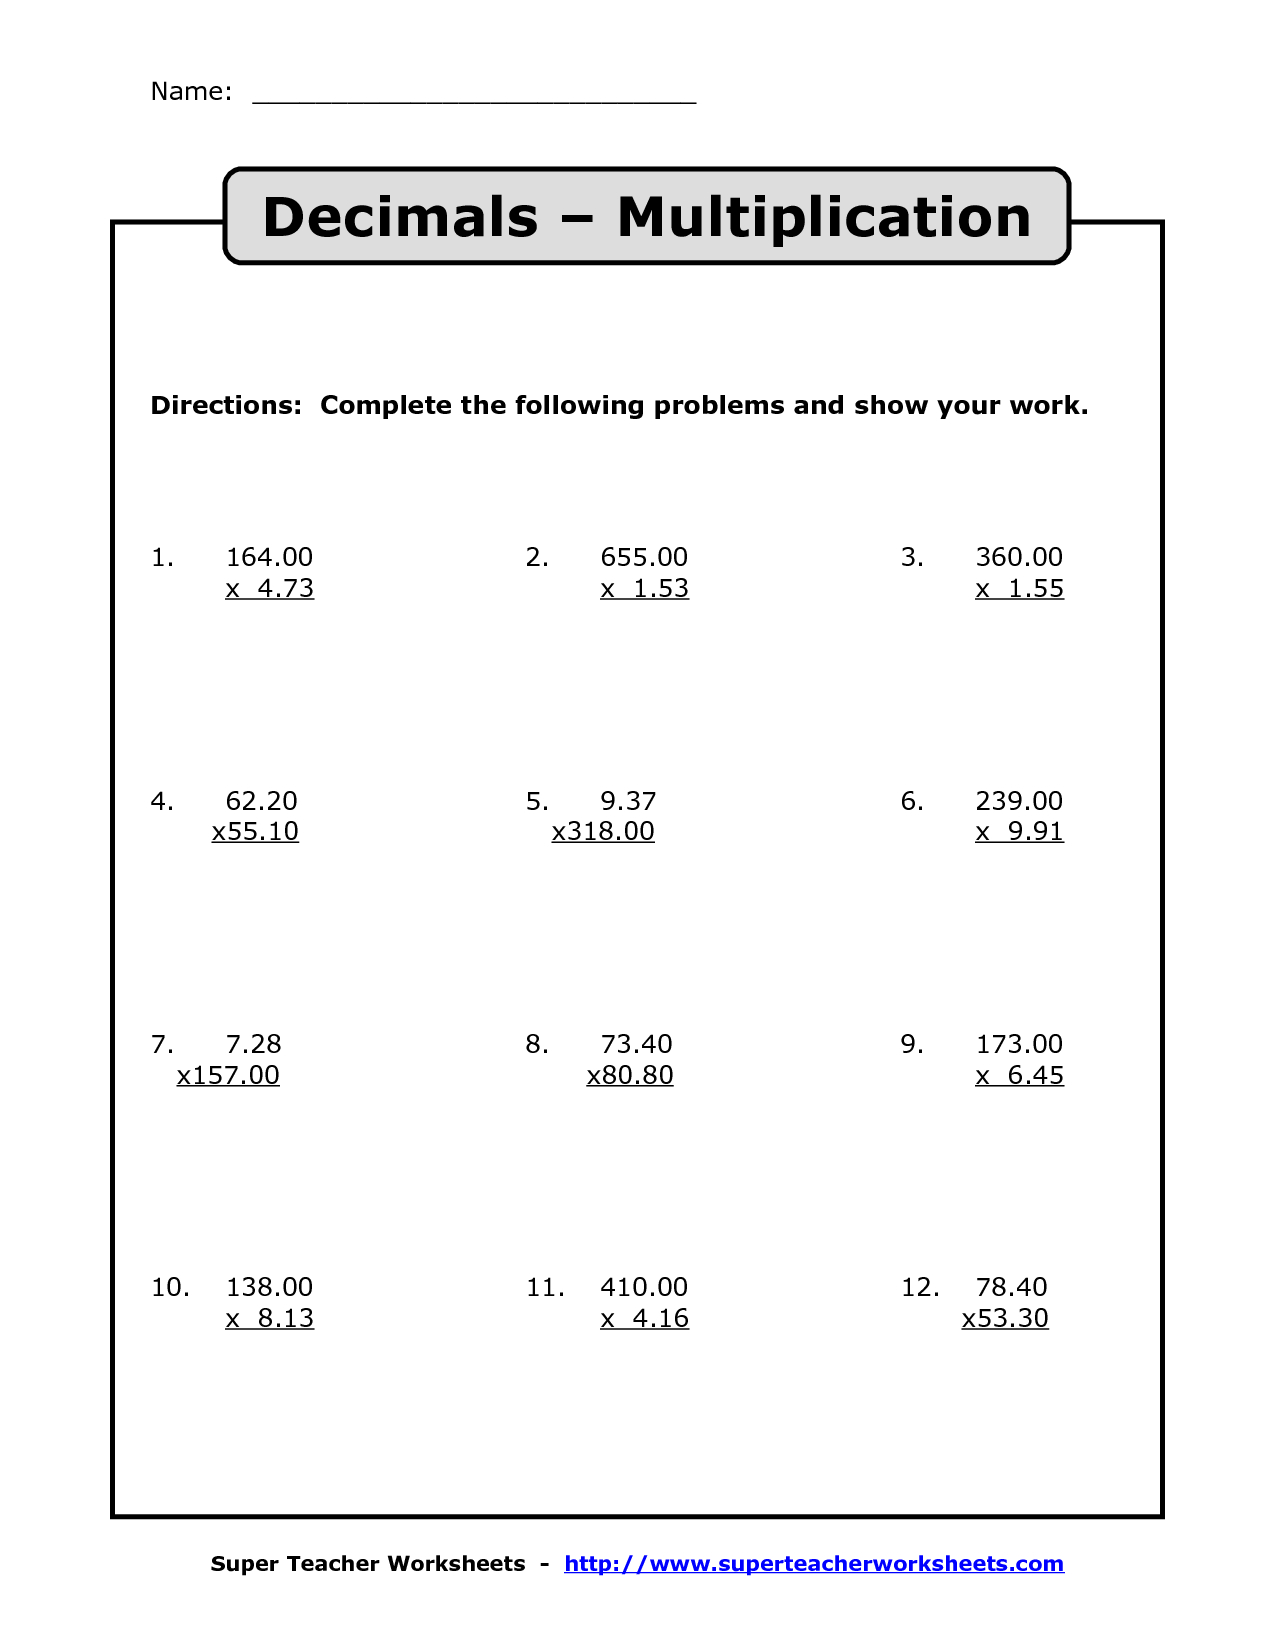 Multiplying Decimals | Multiplication With Decimals Worksheets - Free Printable Multiplying Decimals Worksheets